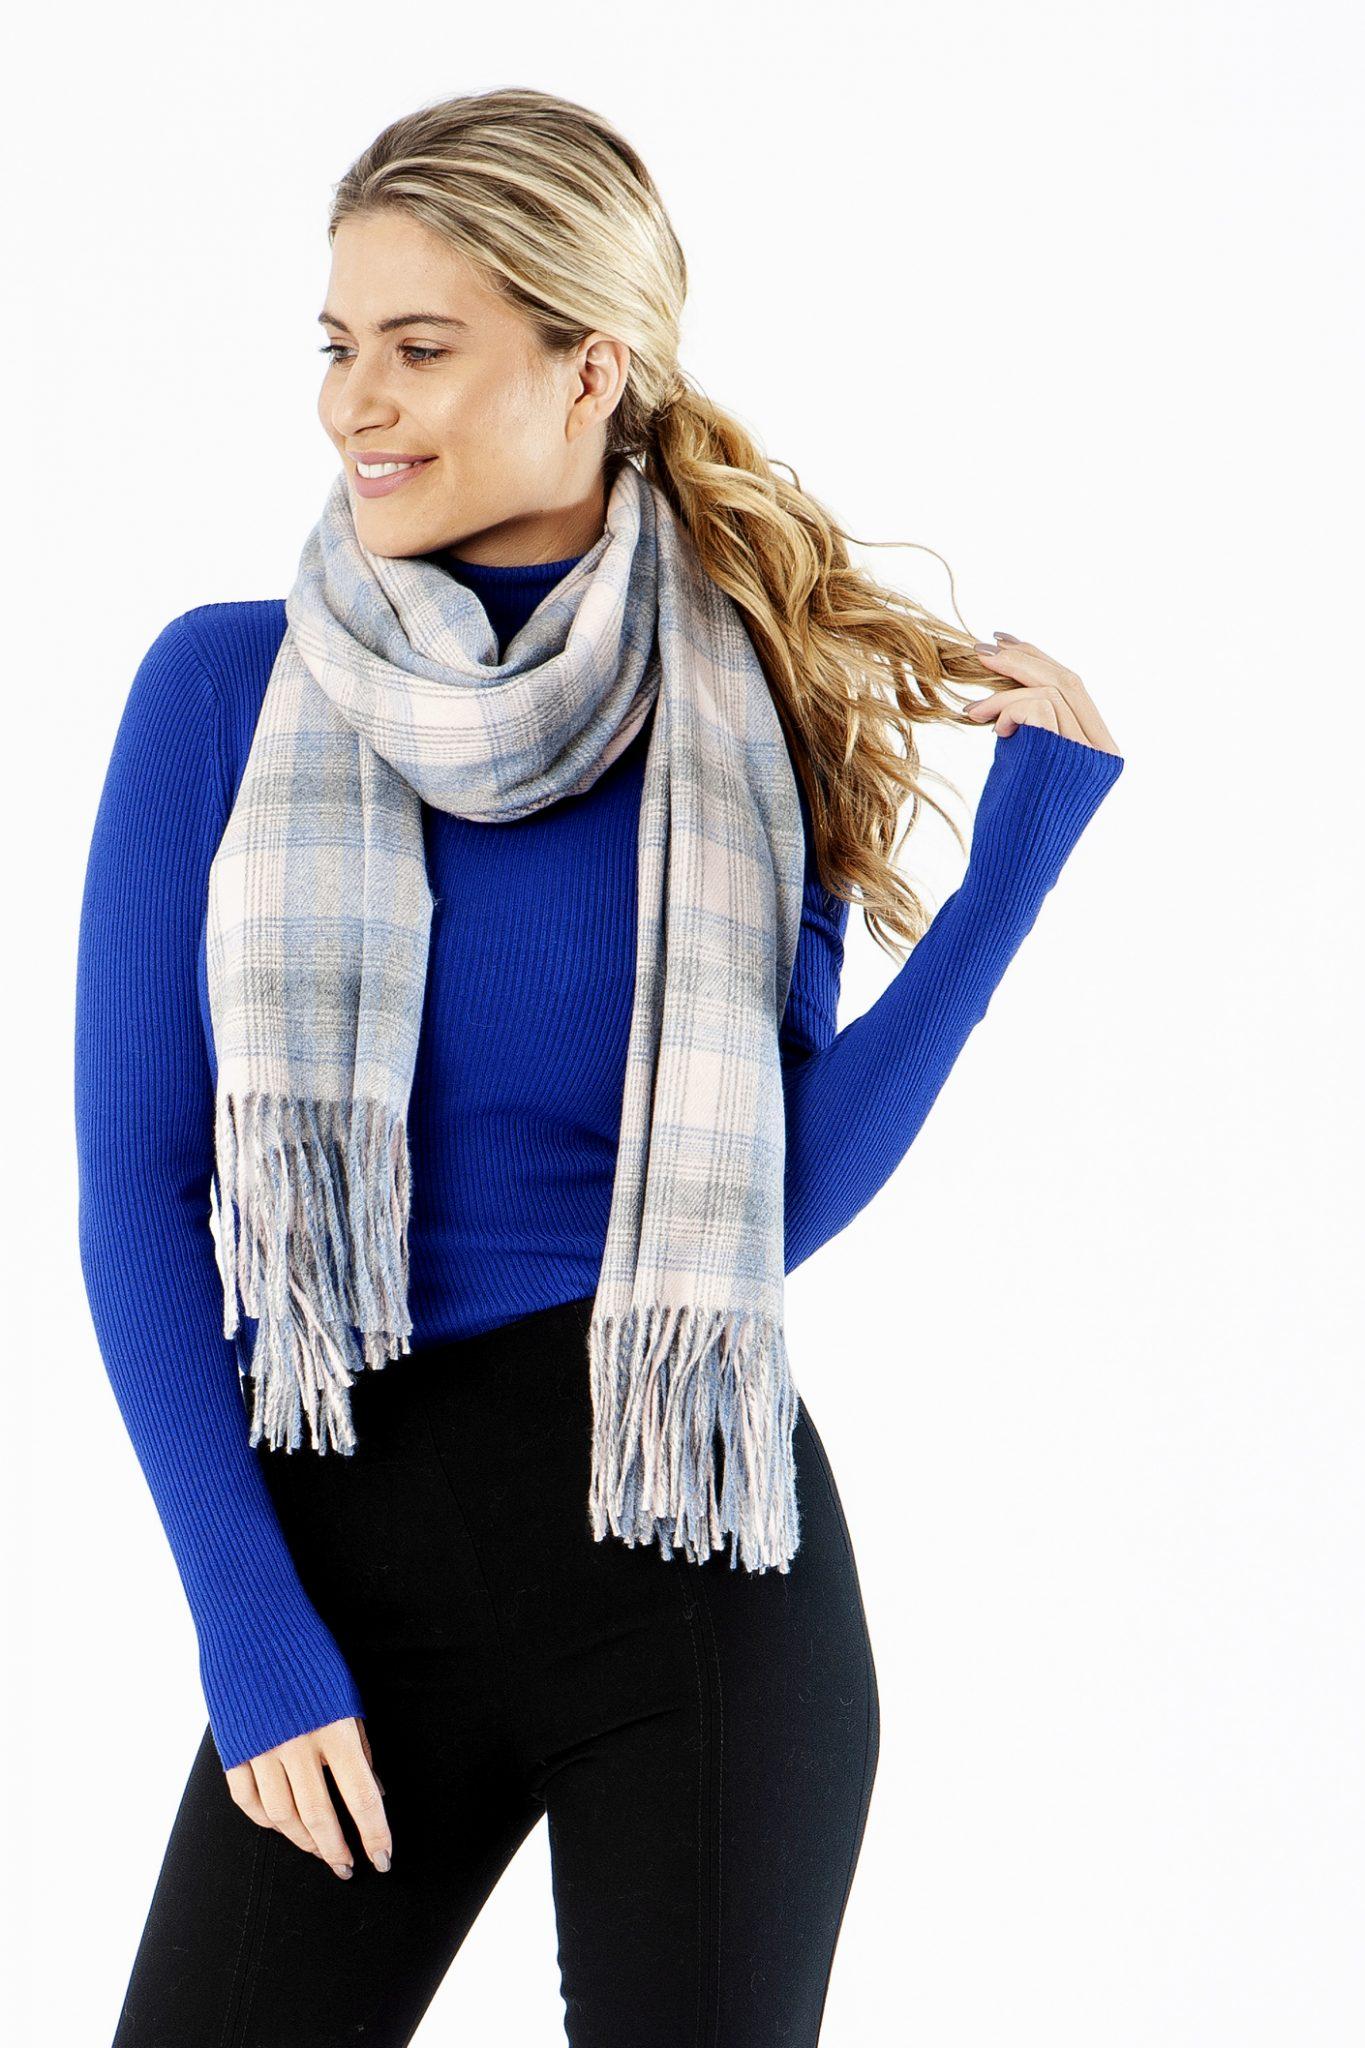 womenswear-ecommerce-fashion-photography-manchester